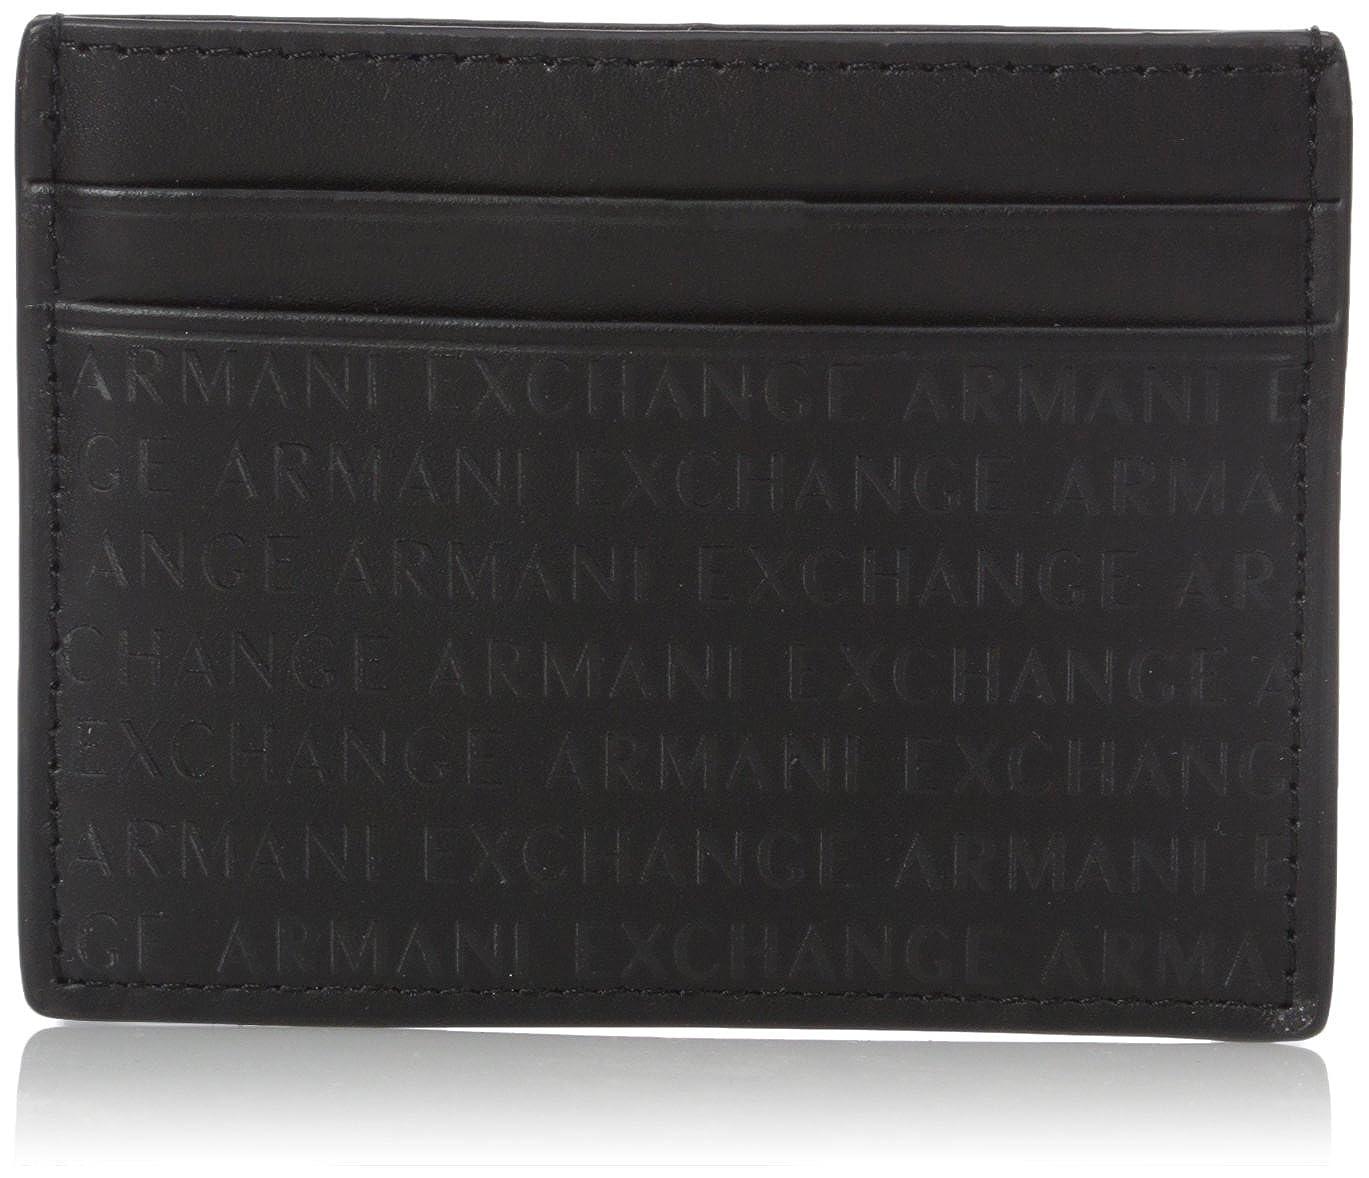 Armani Exchange Men's Laser Logo Cardcase black One Size 958027CC51700020